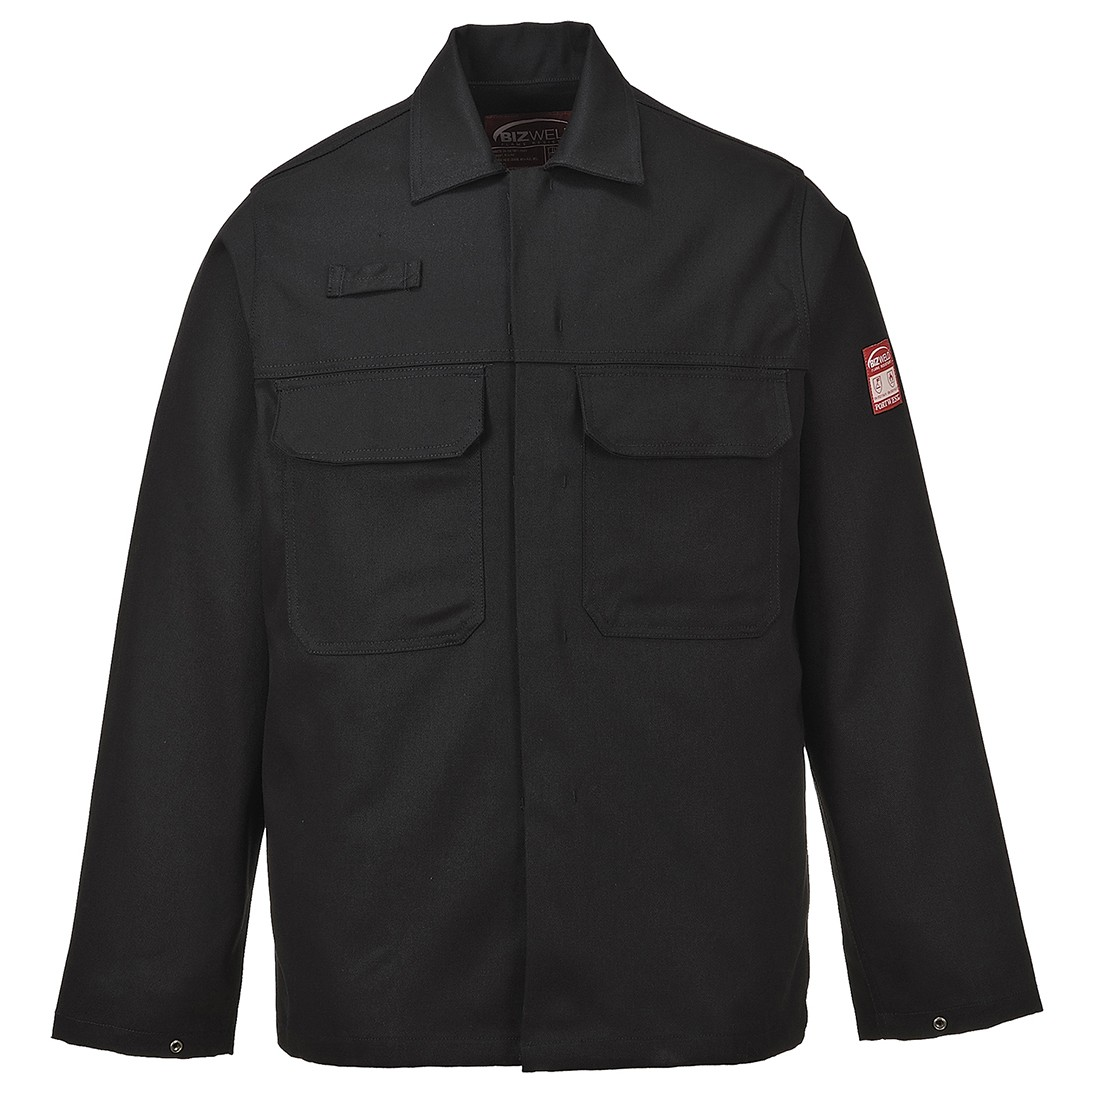 Bizweld Jacket w/ Radio loop, Stud adjustable cuffs & phone pocket